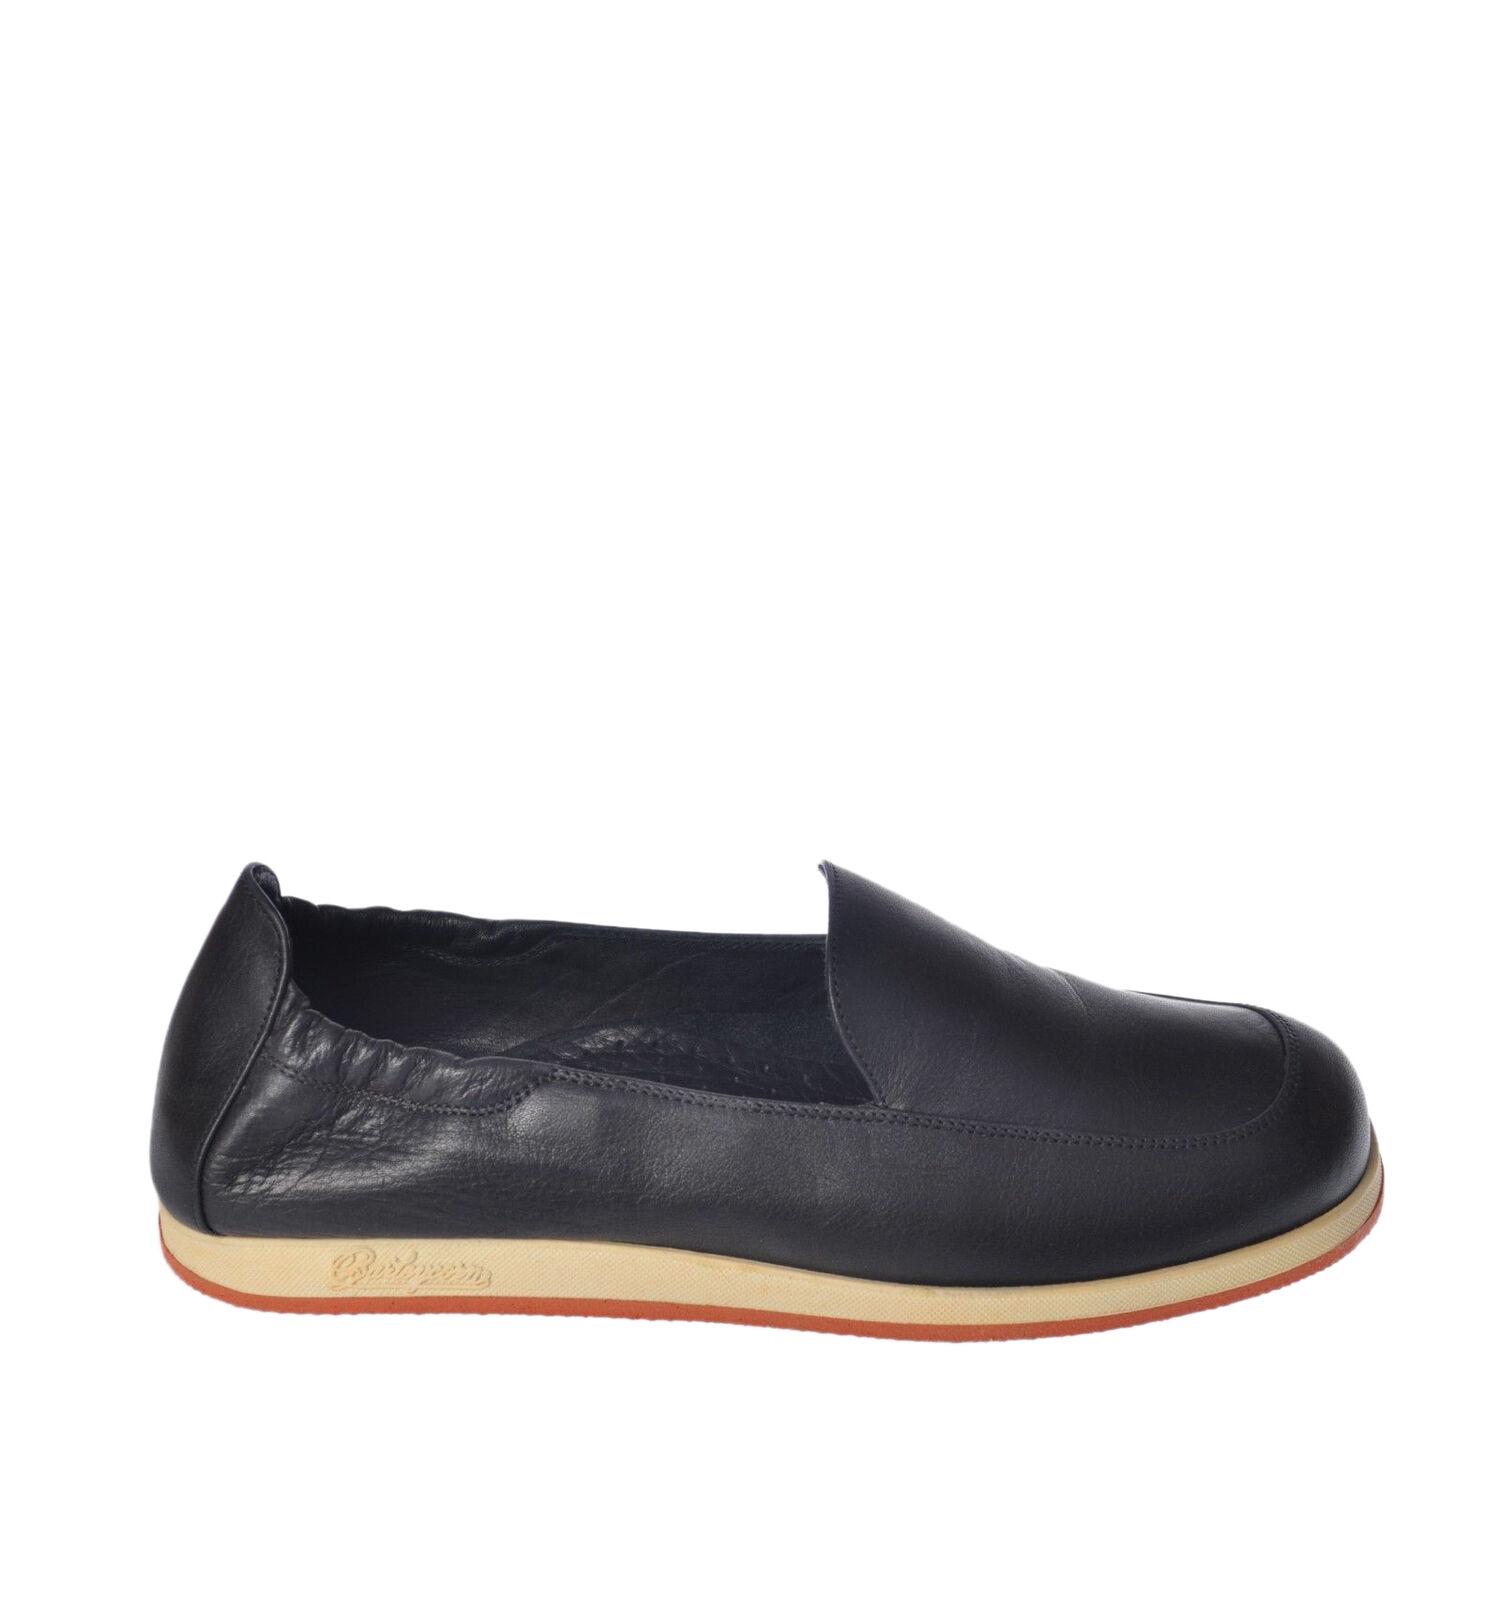 Barleycorn - scarpe-Moccasins - Woman - nero - 5143120C184000